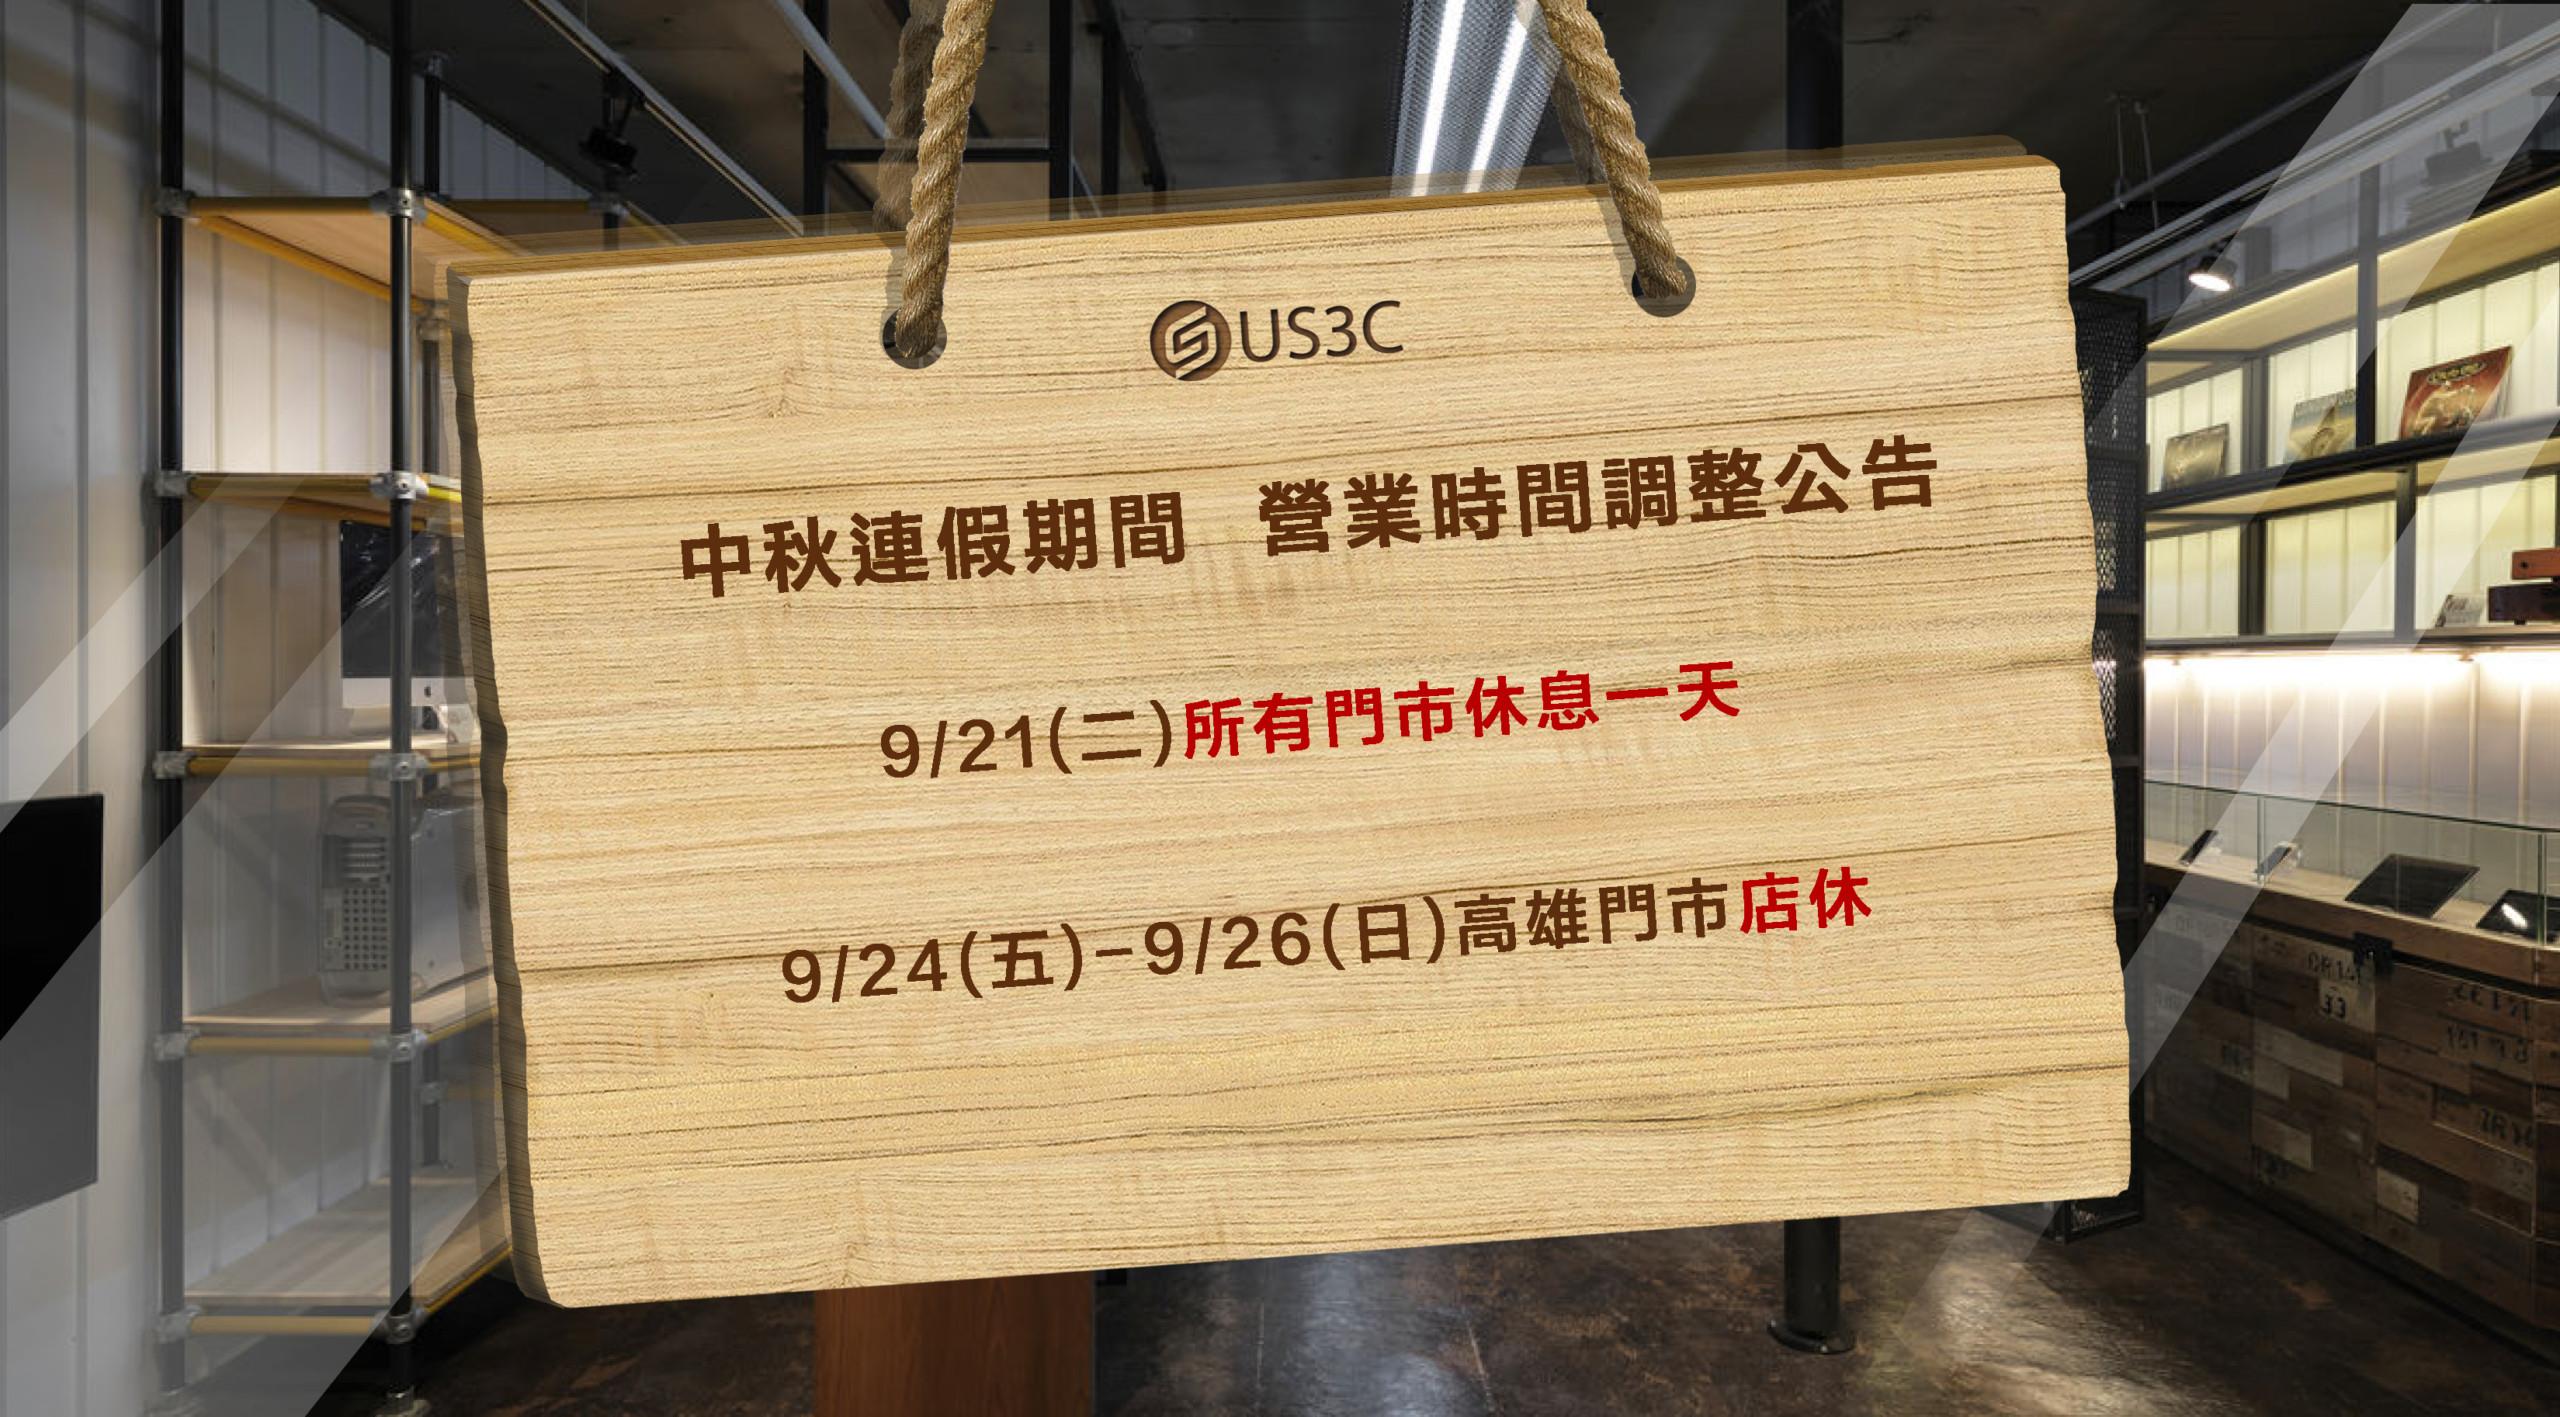 US3C - 新北板橋店